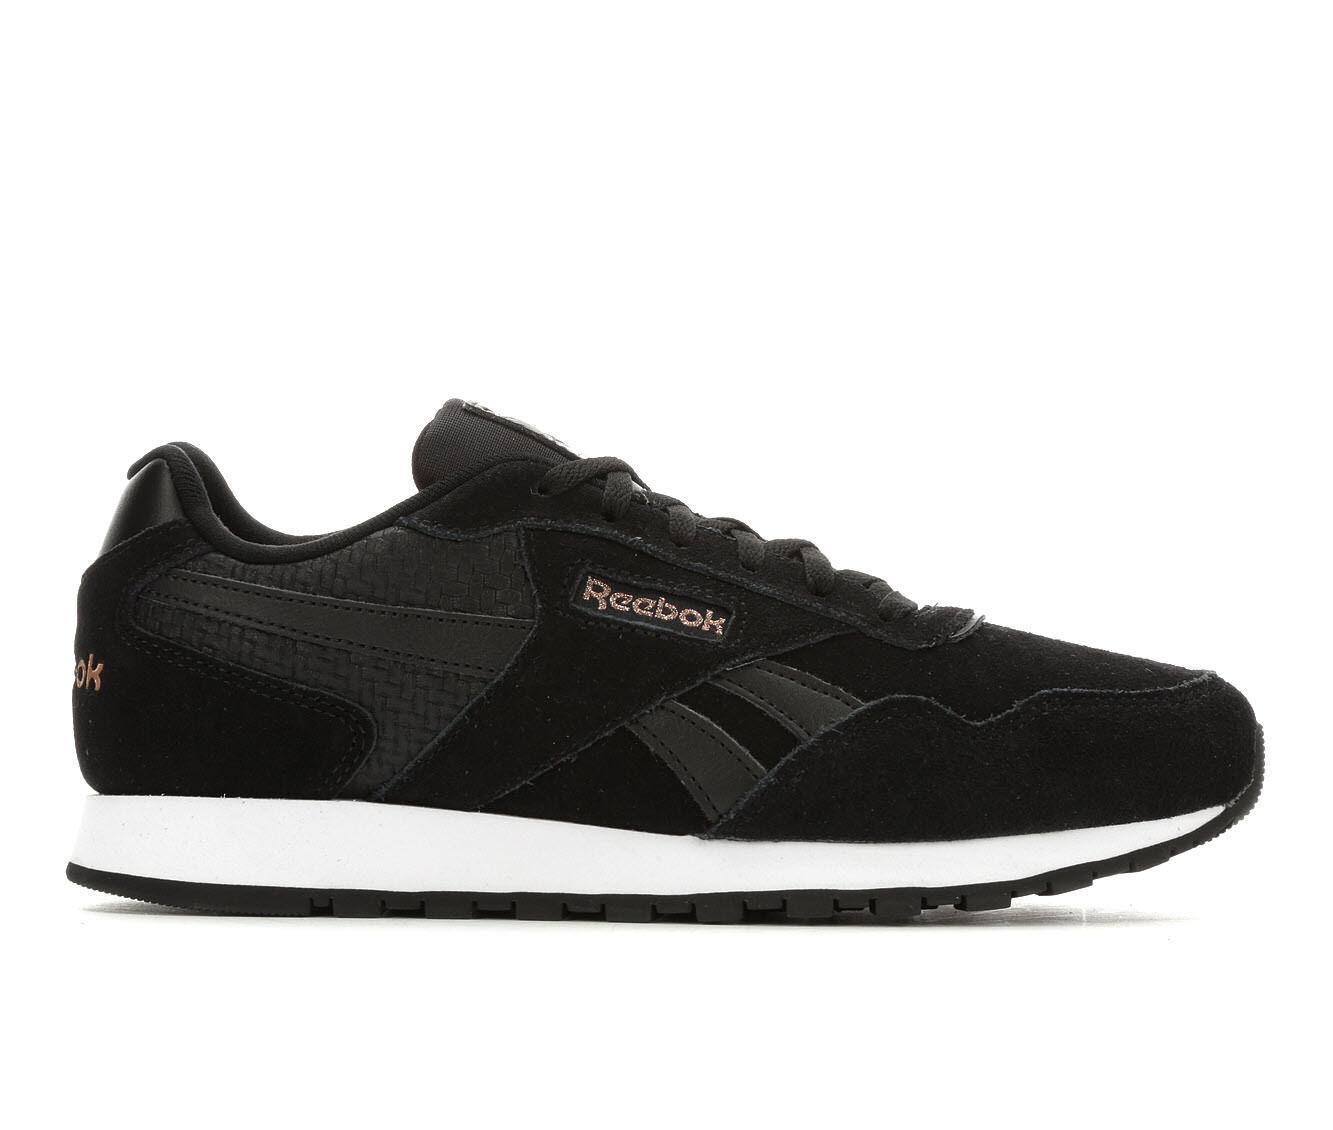 Women's Reebok Classic Harman Run Retro Sneakers Black/Wht/Rose